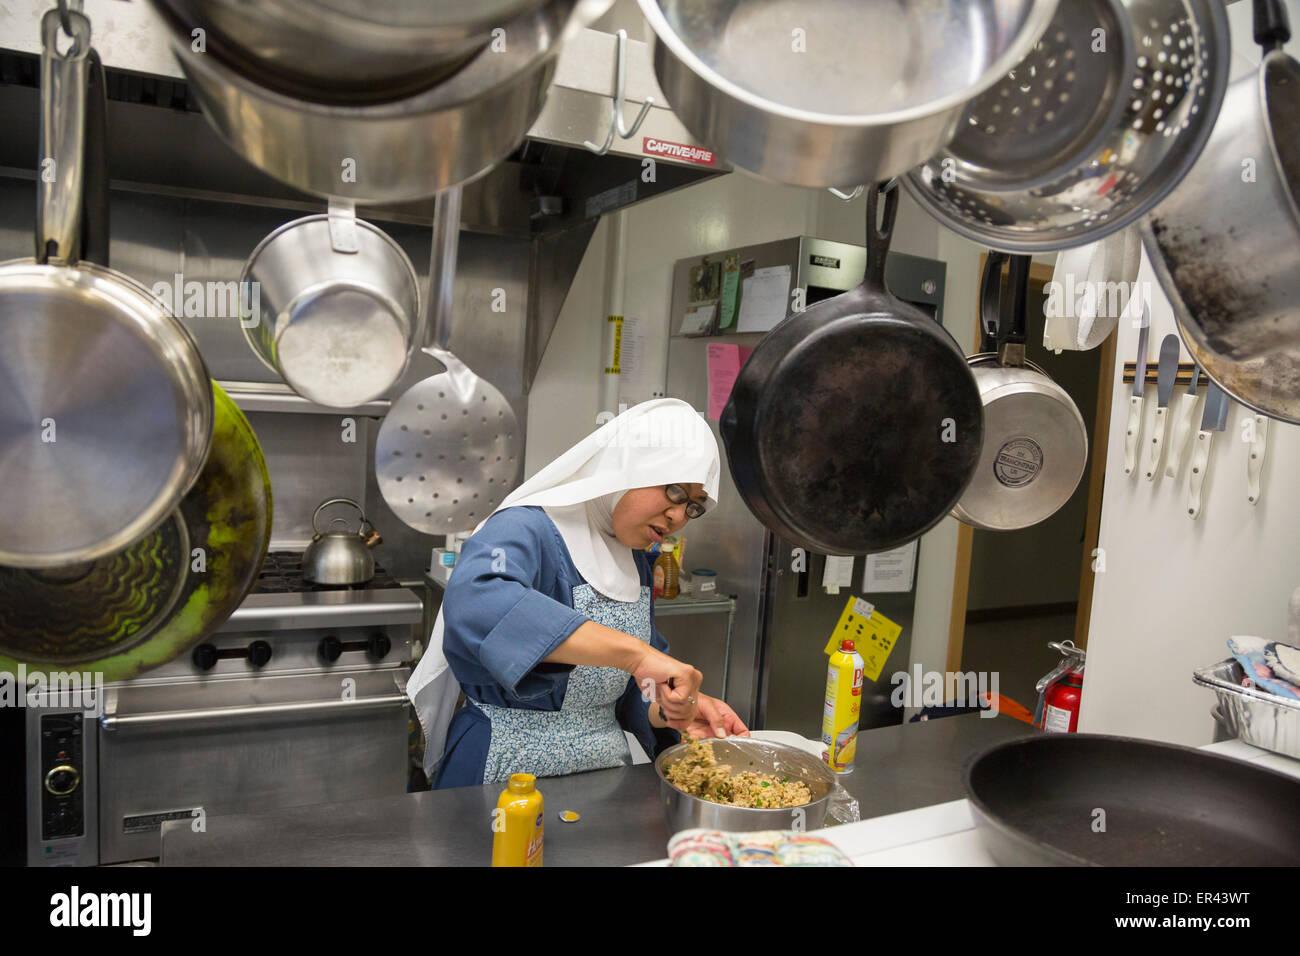 Virginia Dale, Colorado - Sister Maria Josepha prepares food in the kitchen of the Abbey of St. Walburga. - Stock Image